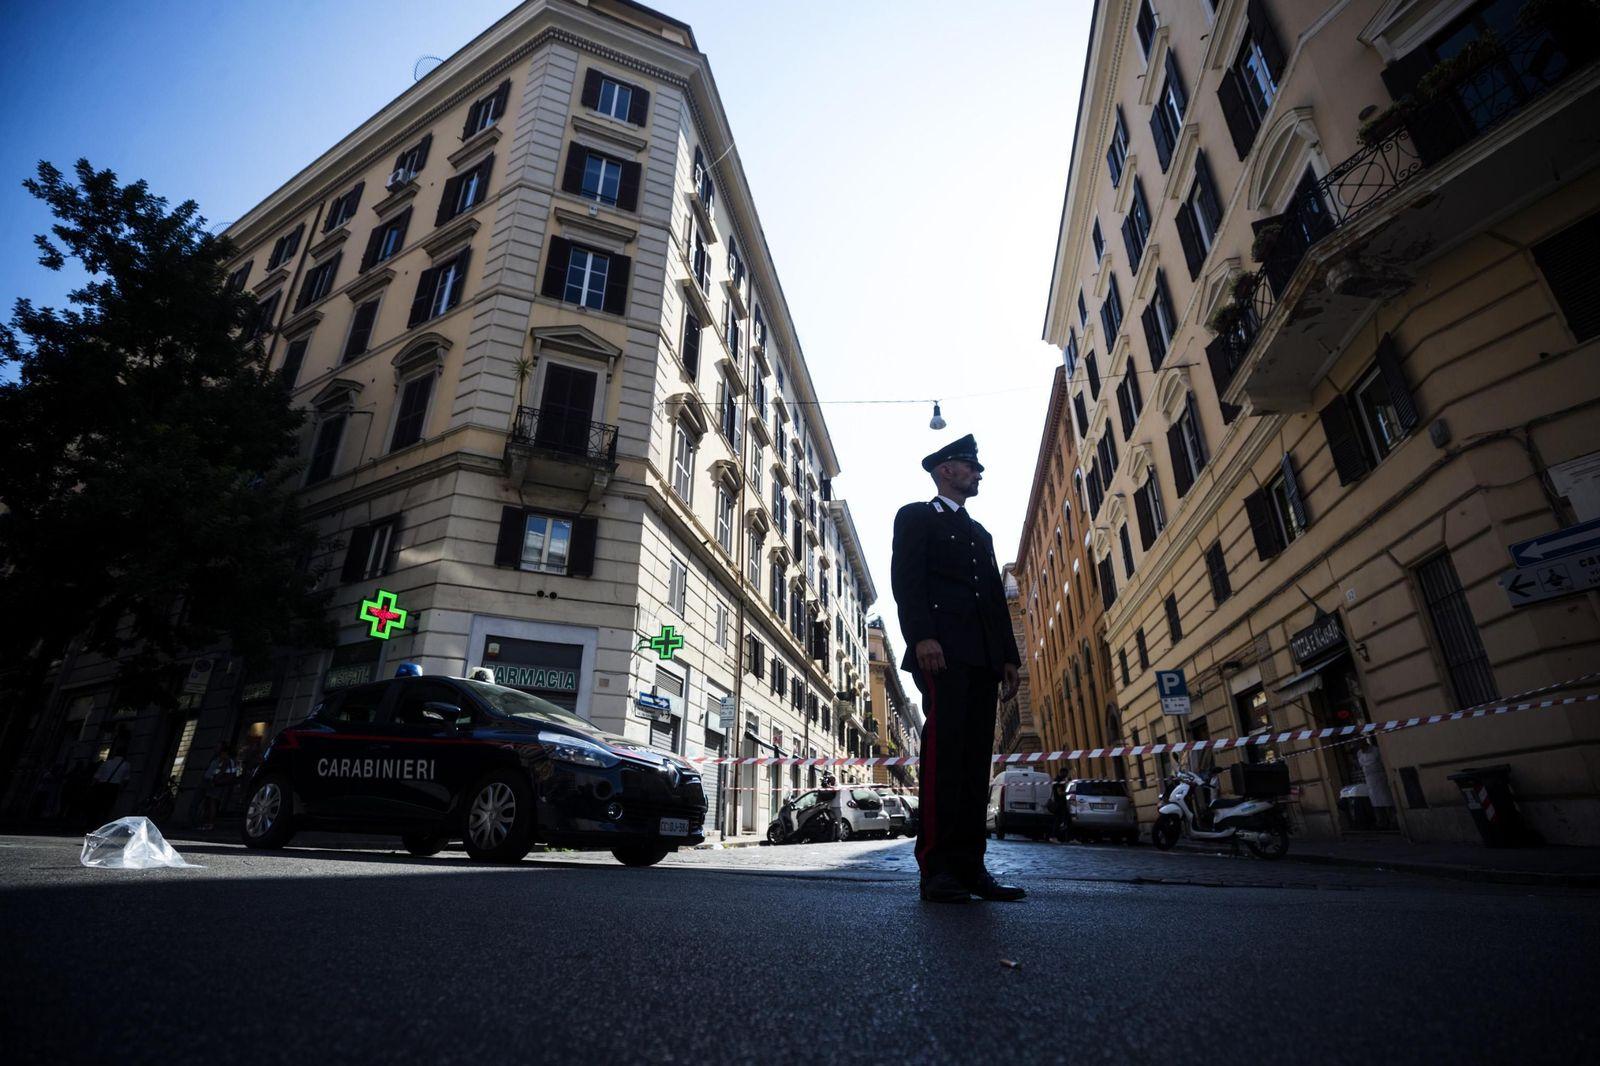 Tötung eines Polizisten erschüttert Italien